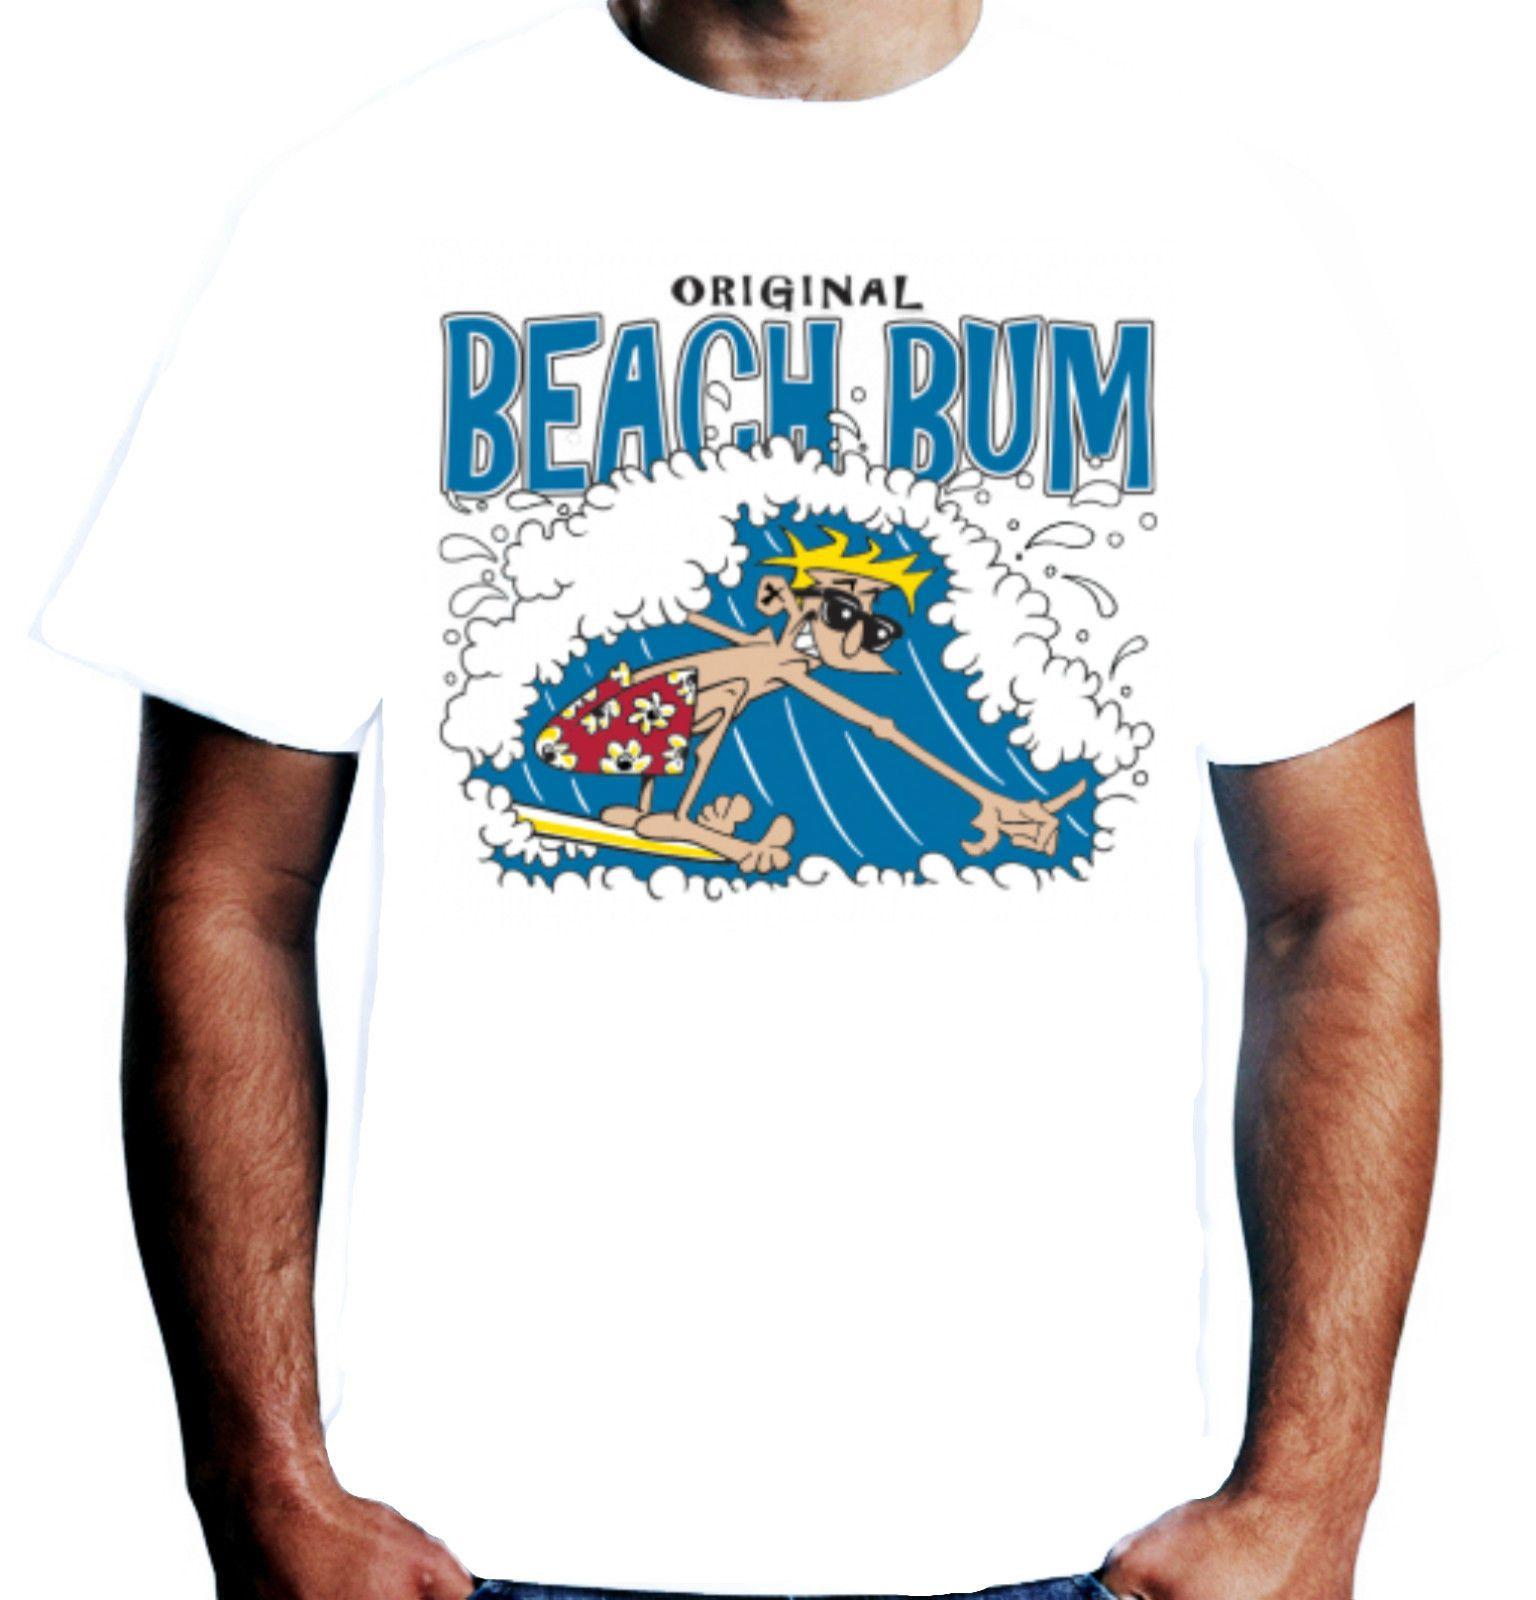 0f178eab5 Velocitee Mens Original Beach Bum T Shirt Dude Holiday Surfer Surfing  W10517 Vintage T Shirts Band T Shirts From Orangeshirt, $10.5  DHgate.Com